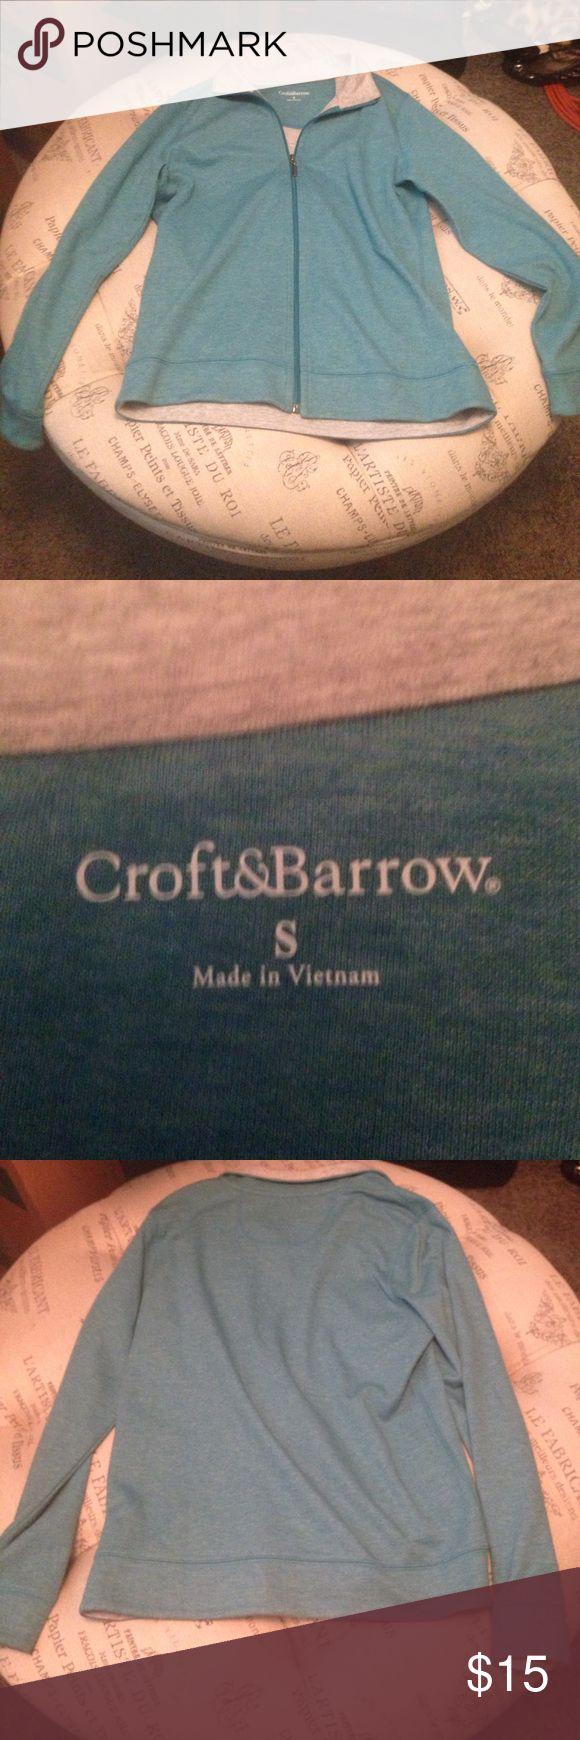 Croft & Barrow blue zip up sweatshirt size small Like new blue zip up sweatshirt by Croft & Barrow size small SKU 36 croft & barrow Tops Sweatshirts & Hoodies